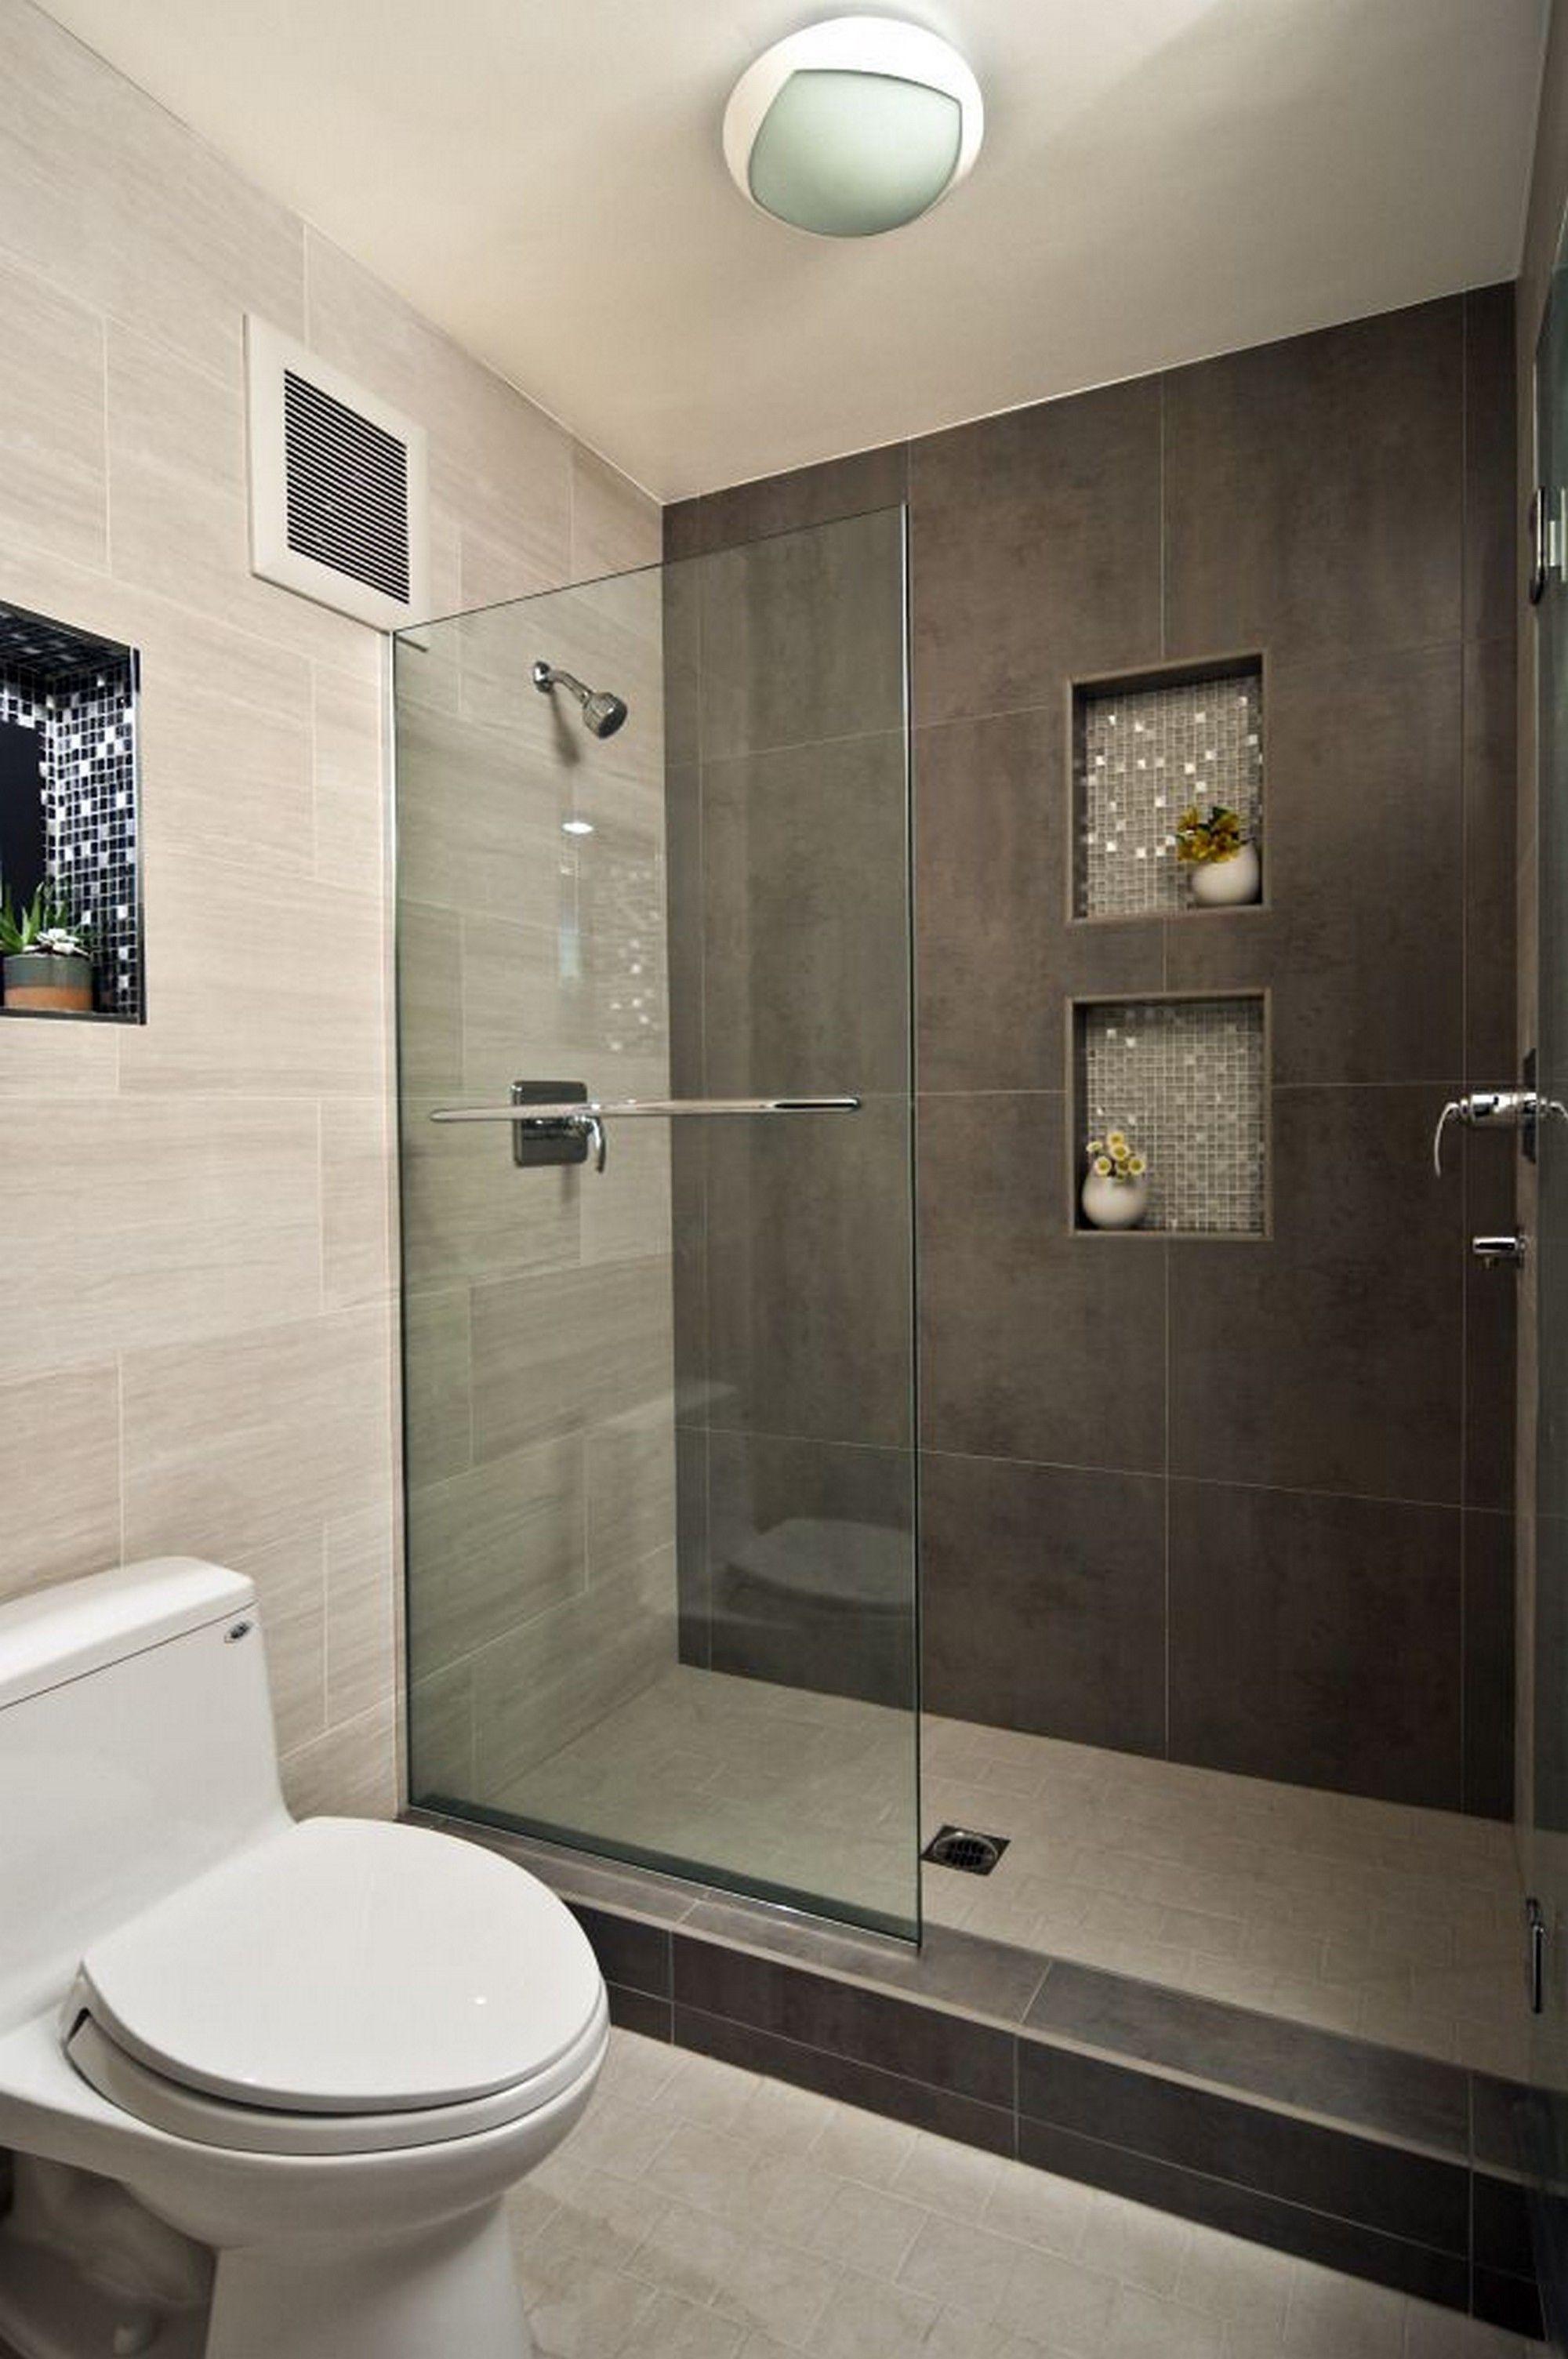 Bathroom Categories : Beautiful. Decor. Farmhouse. Bathroom.   Bathroom  shower design, Small bathroom tiles, Bathroom remodel designs